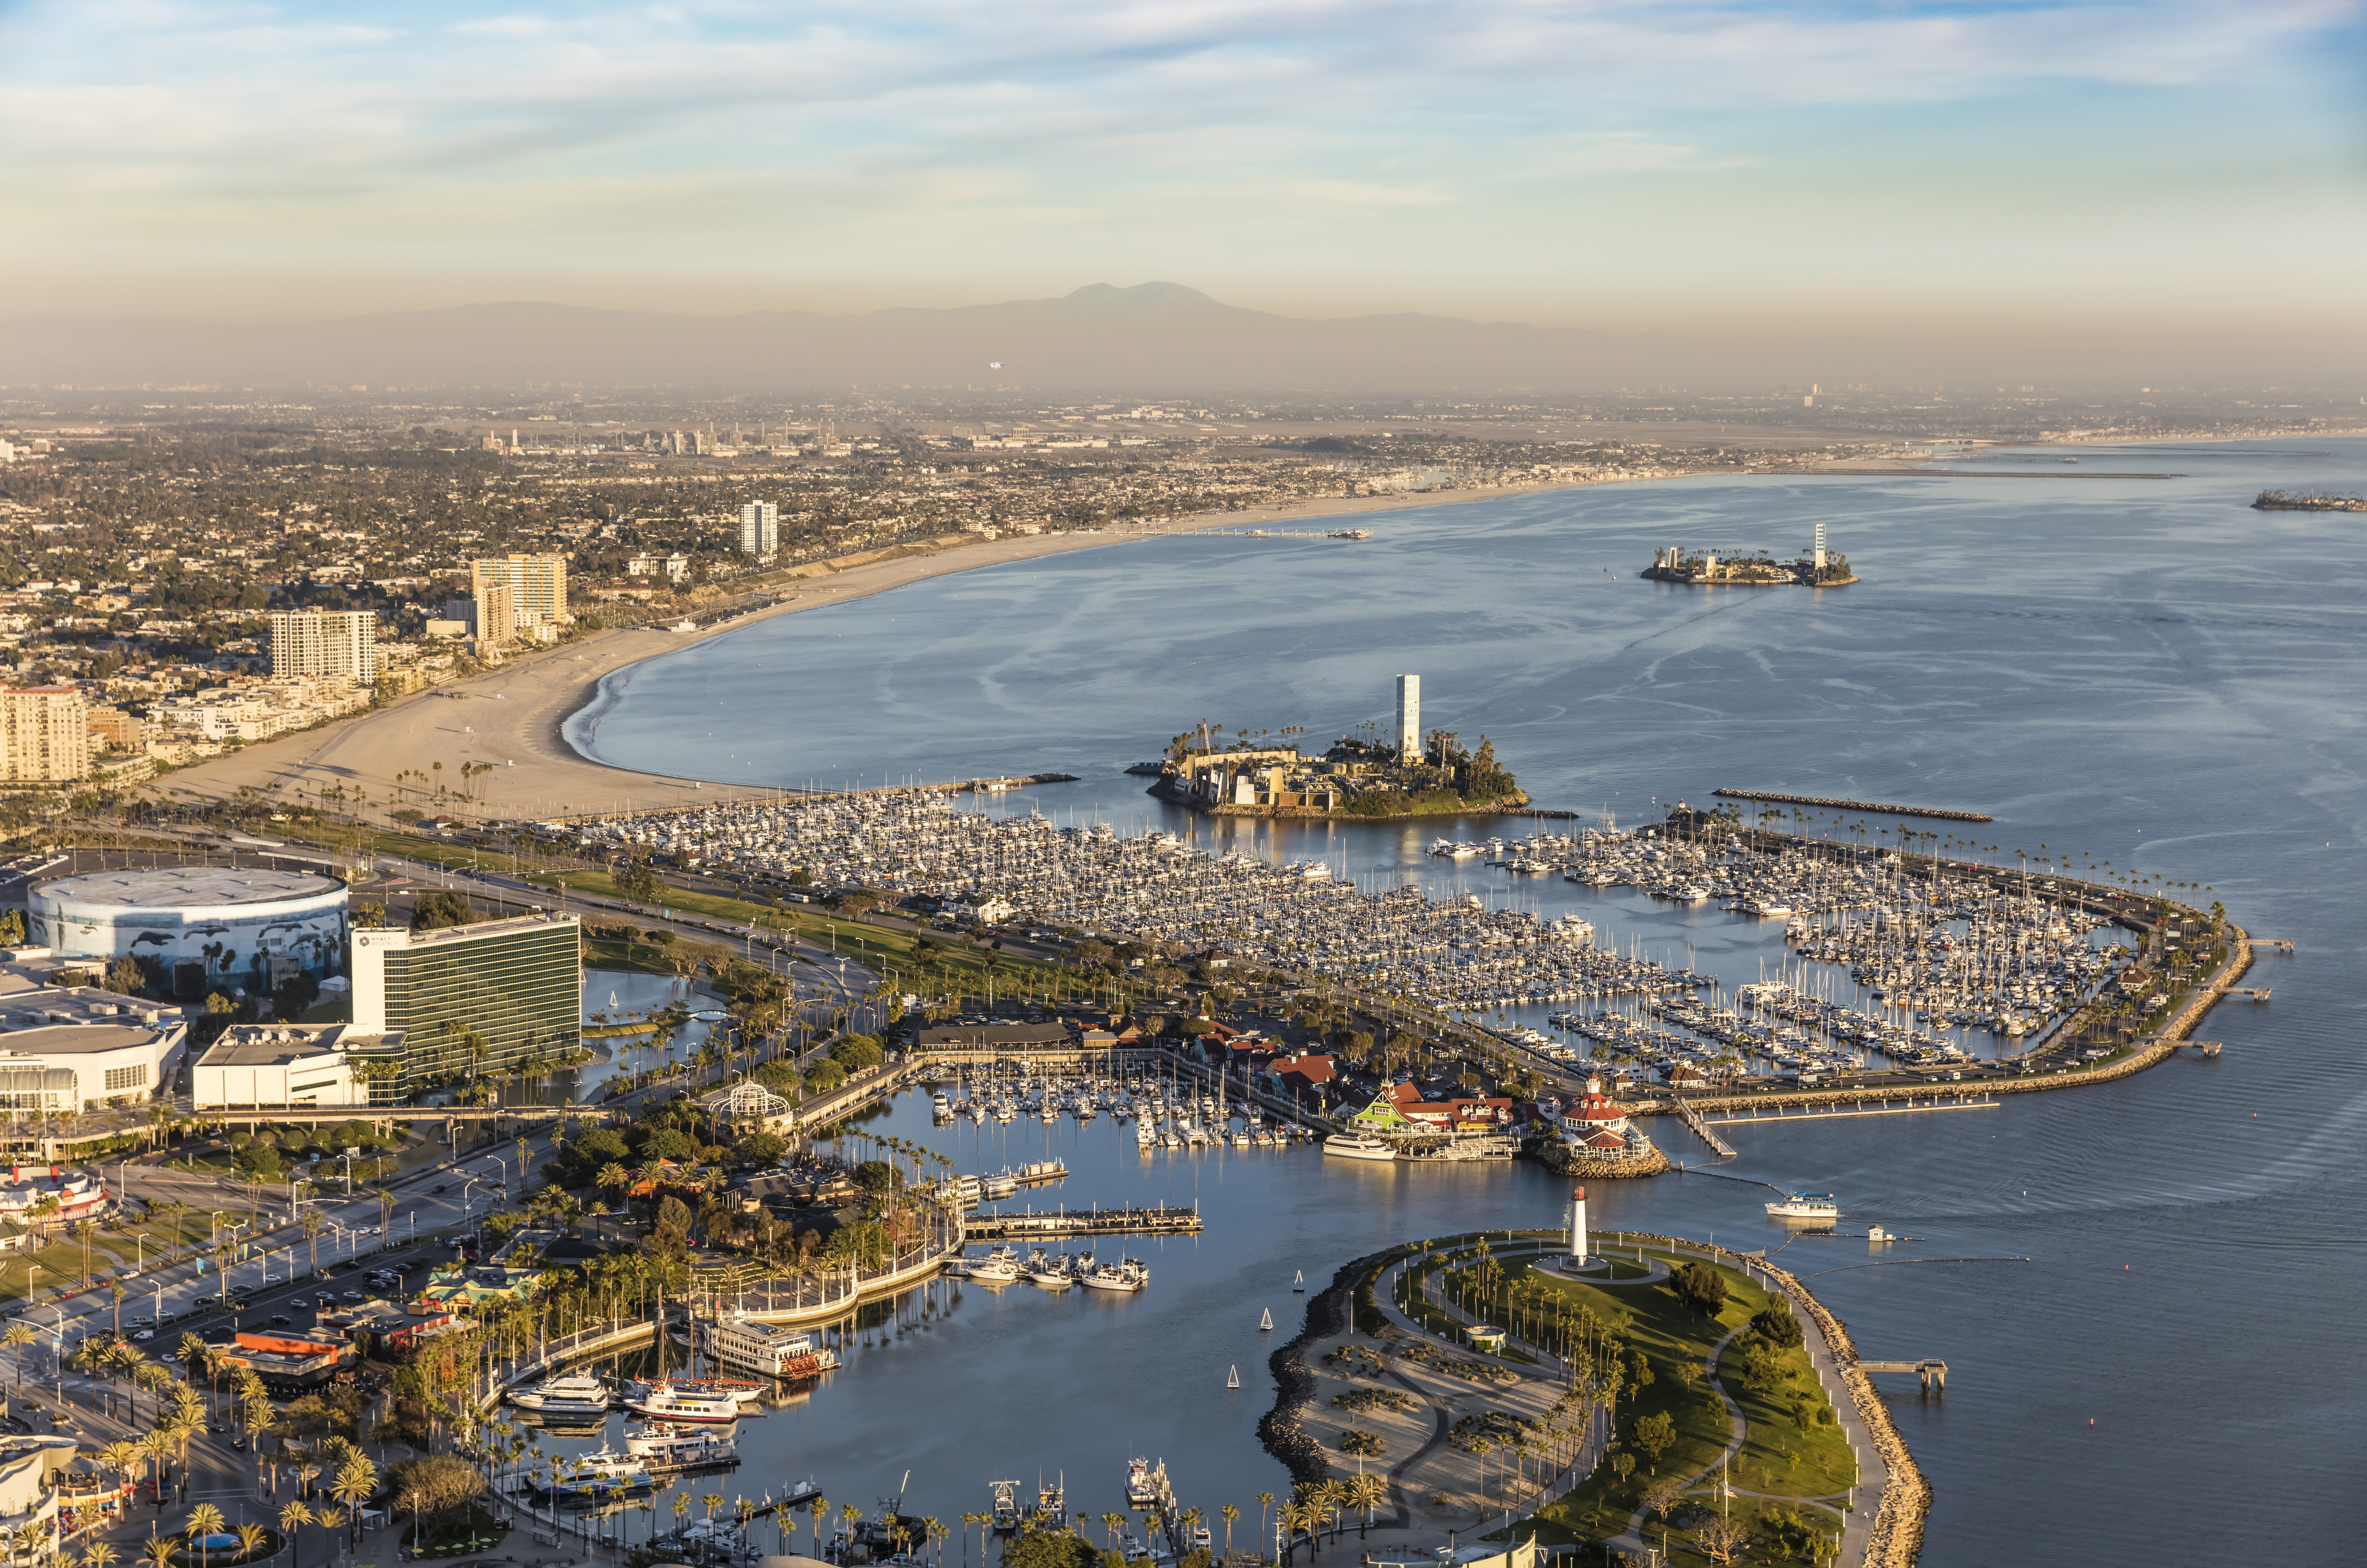 Long Beach's deceptive islands